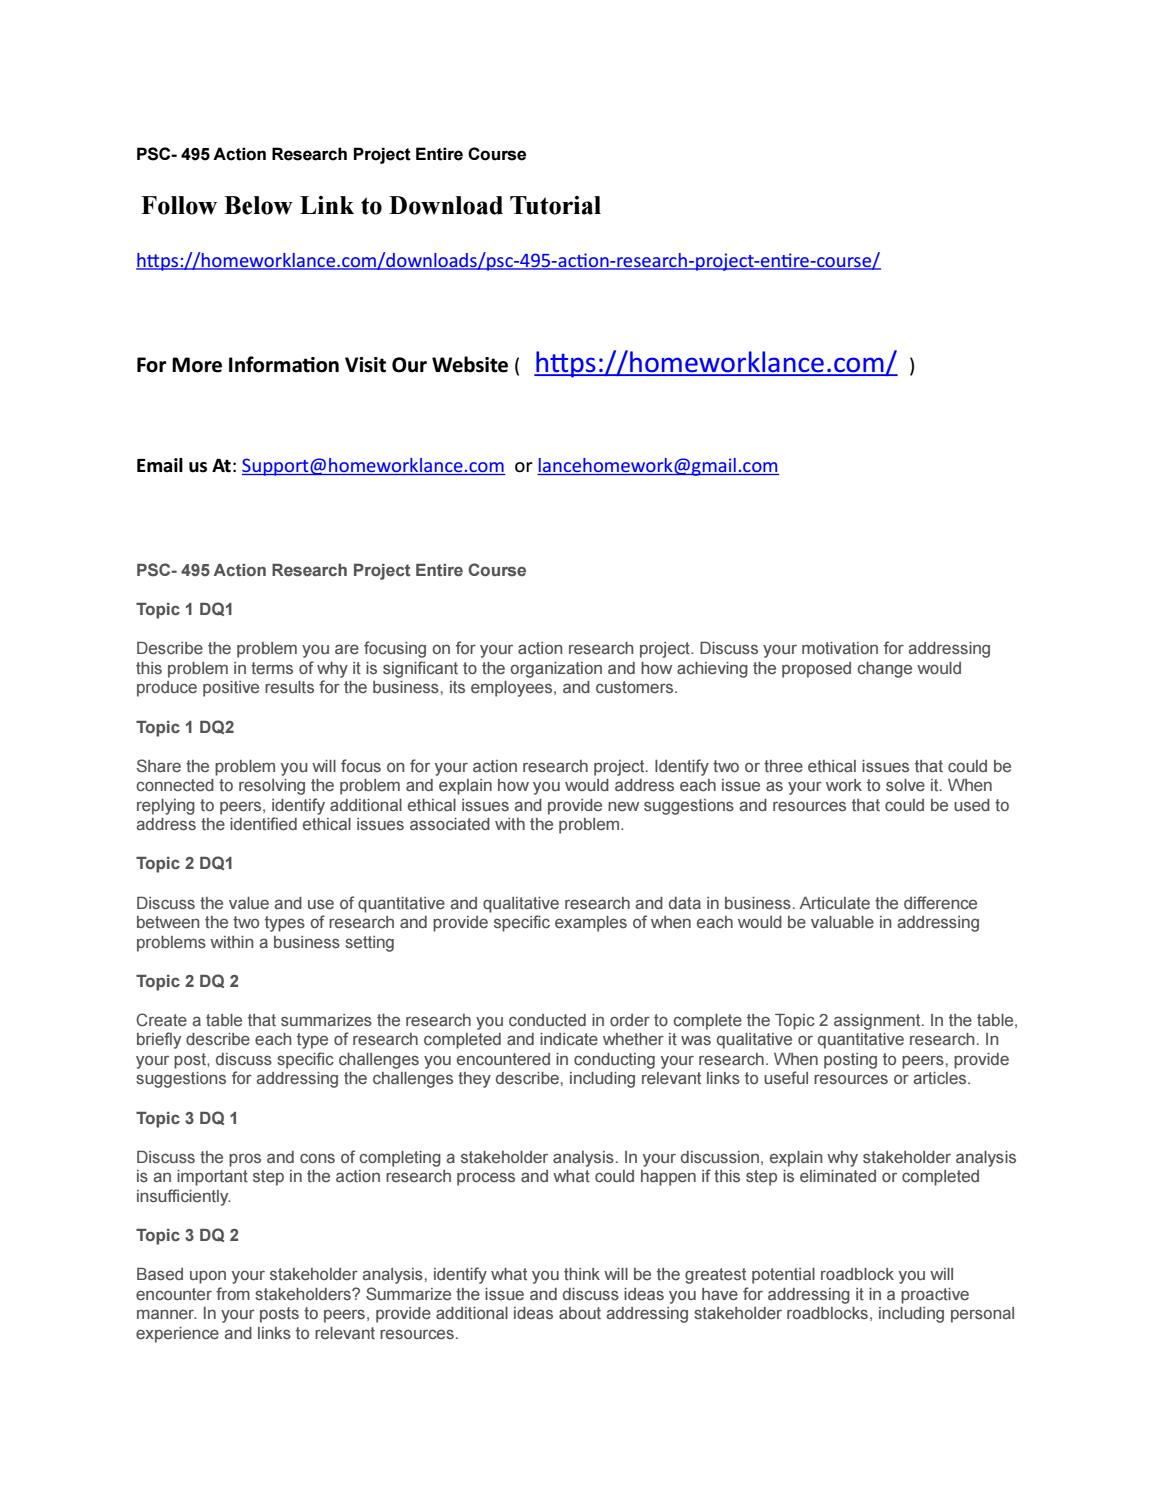 Purchase custom essay hub